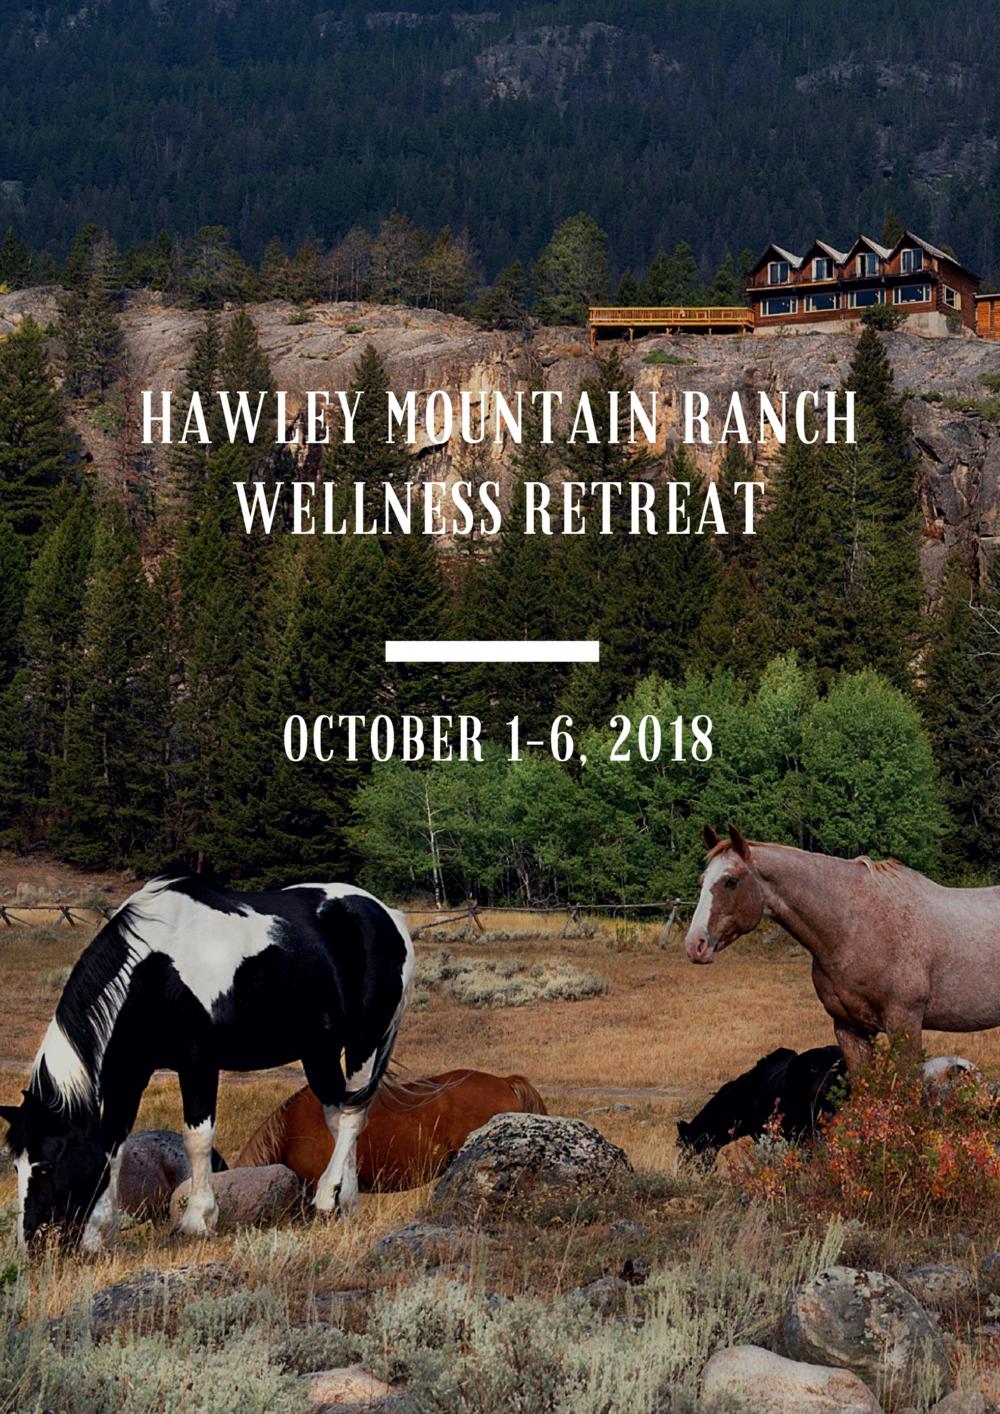 Hawley Mountain ranch wellness retreat.png